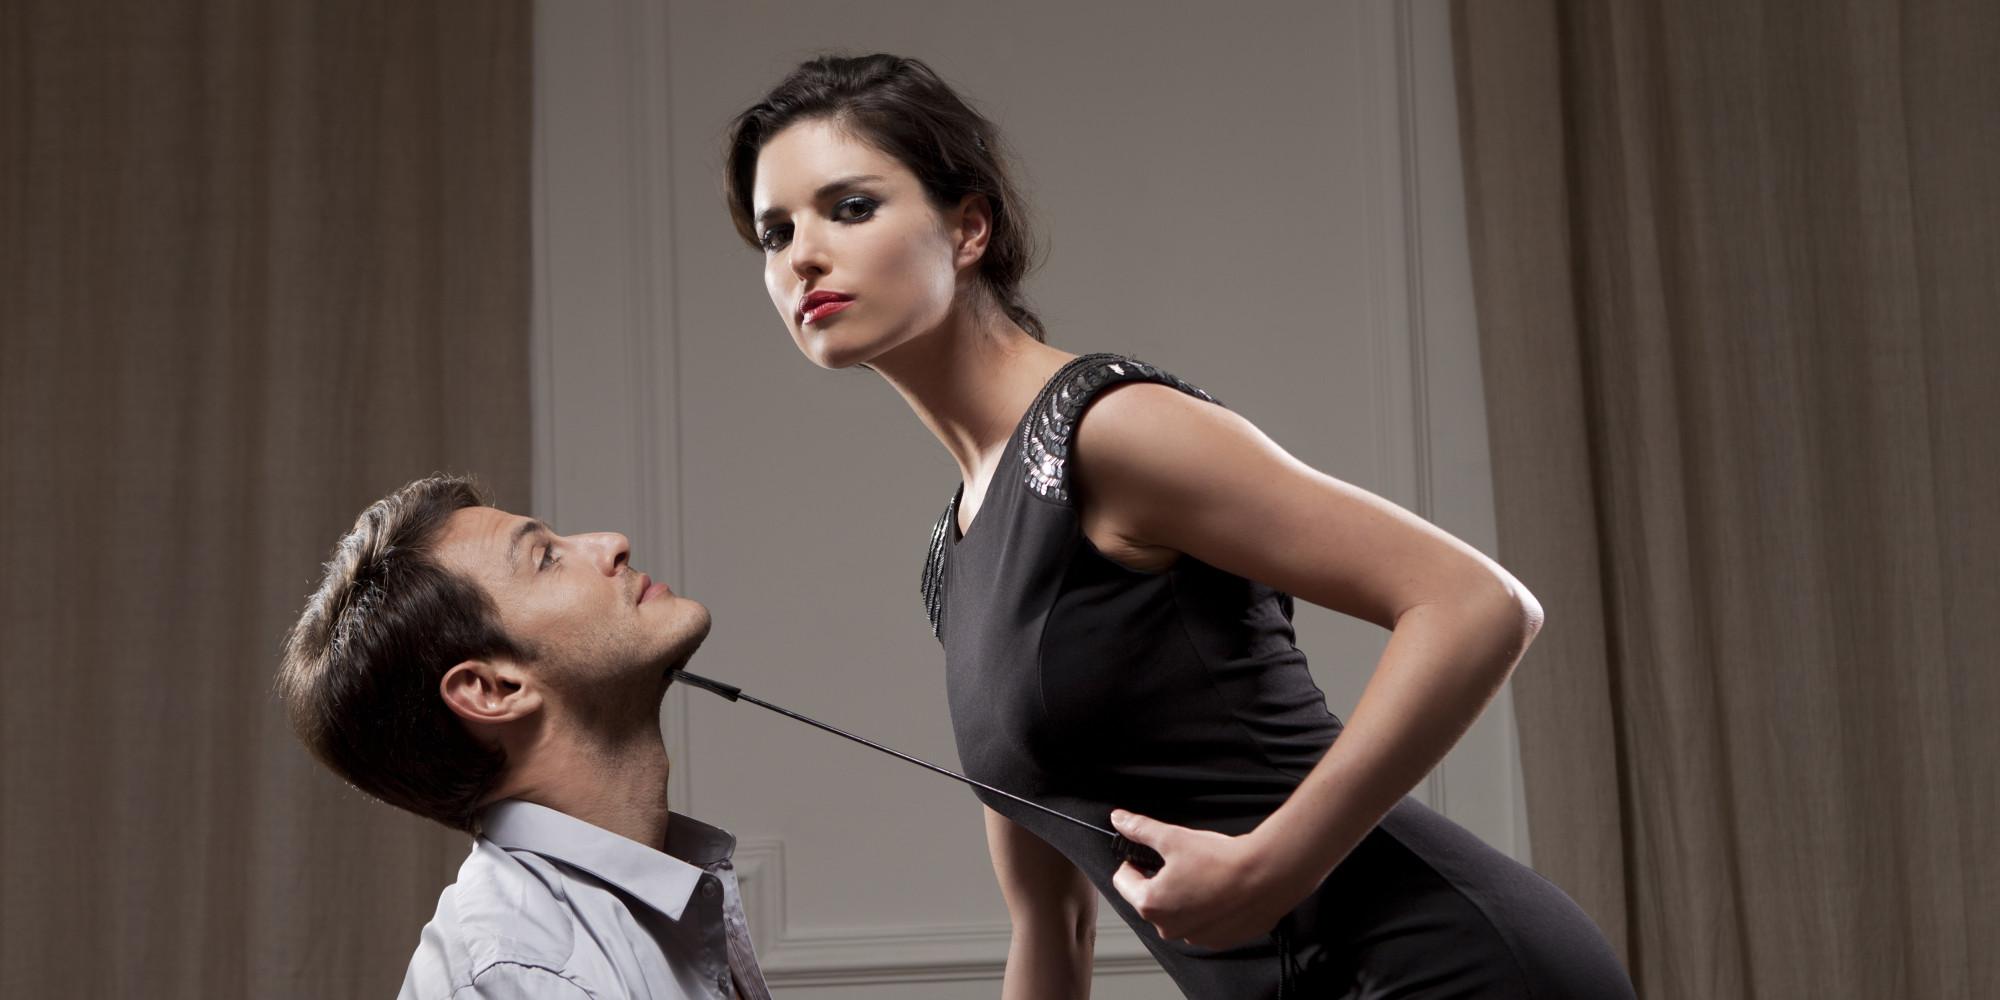 hot women dominating men